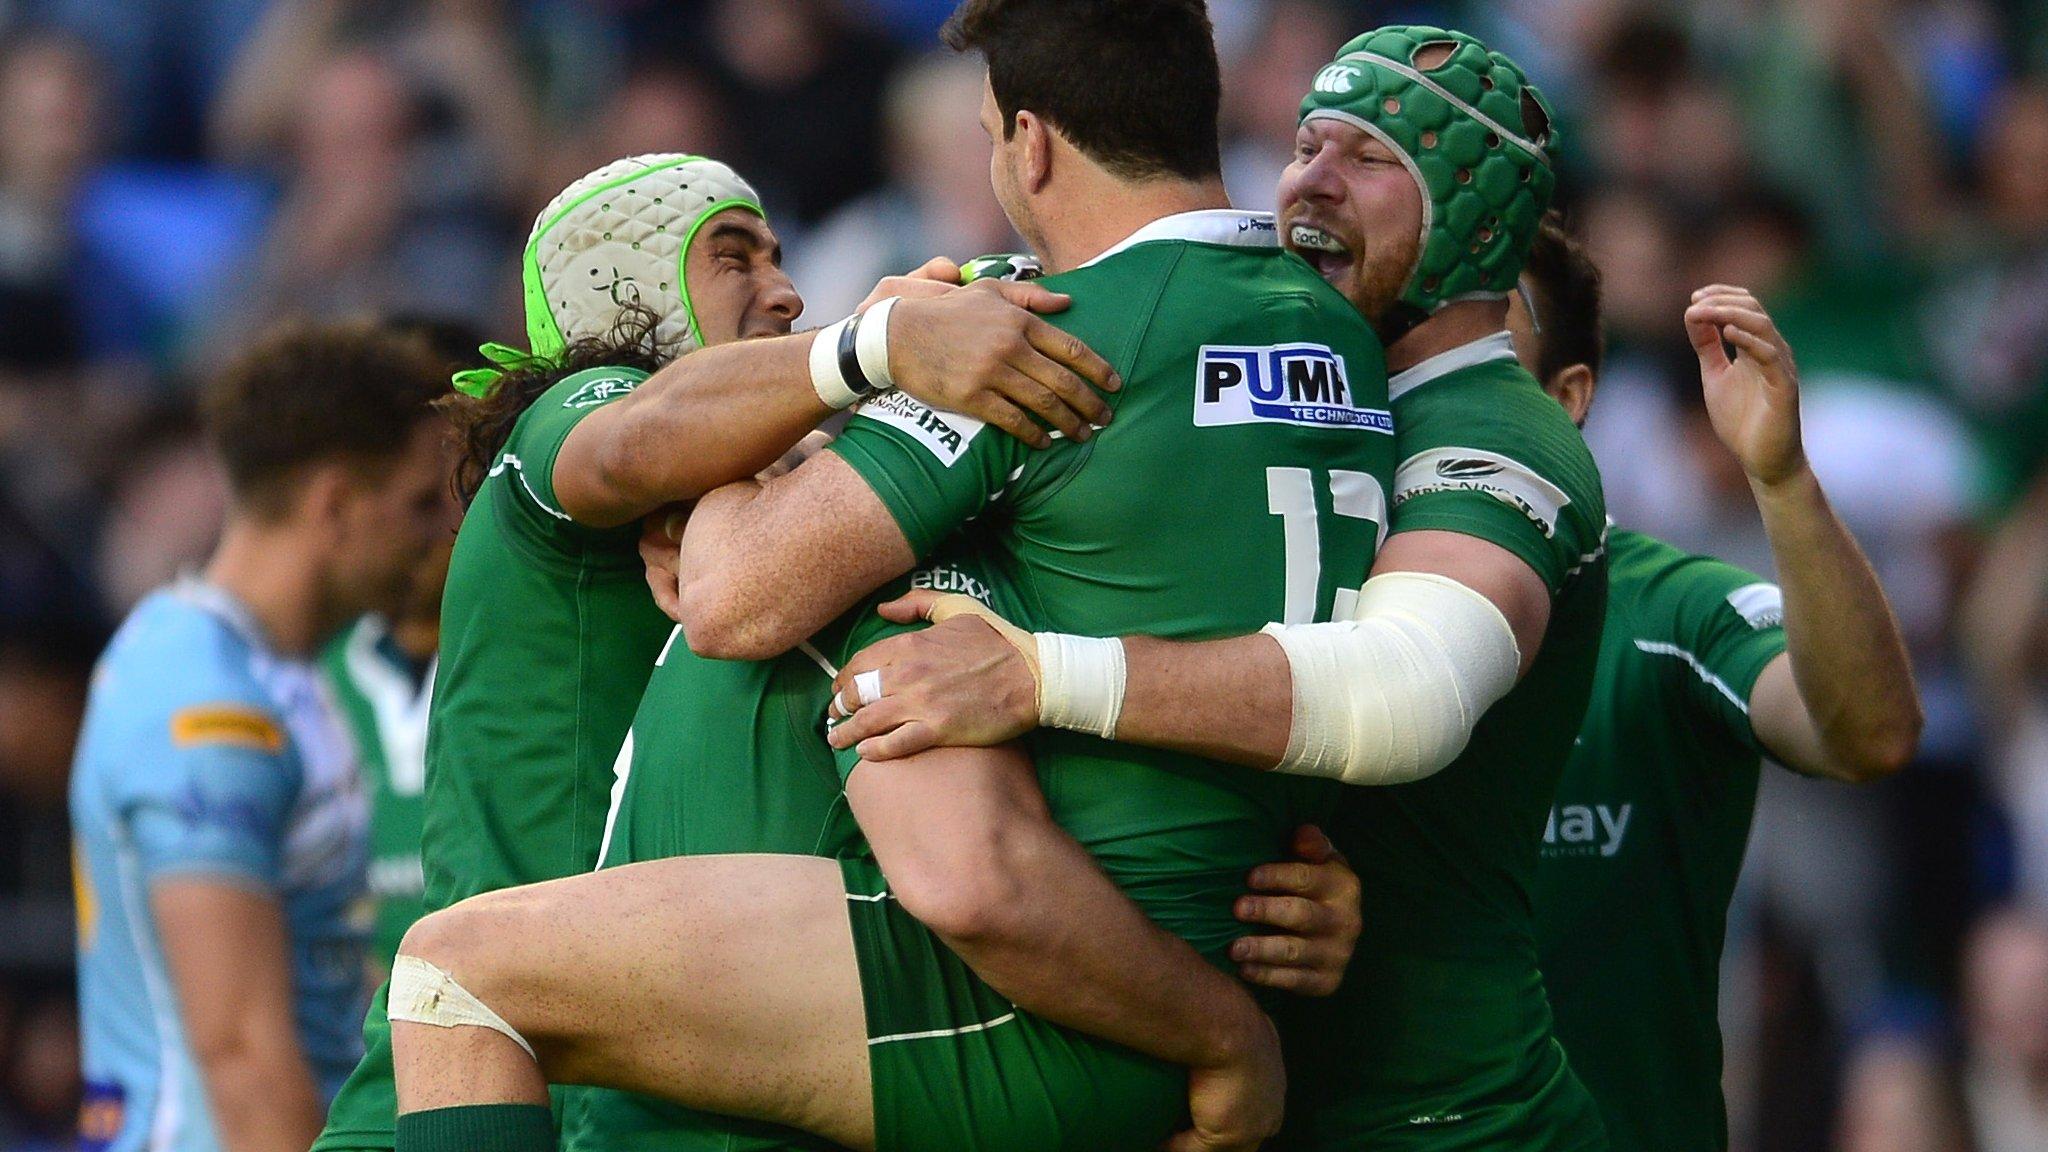 London Irish beat Carnegie to win promotion